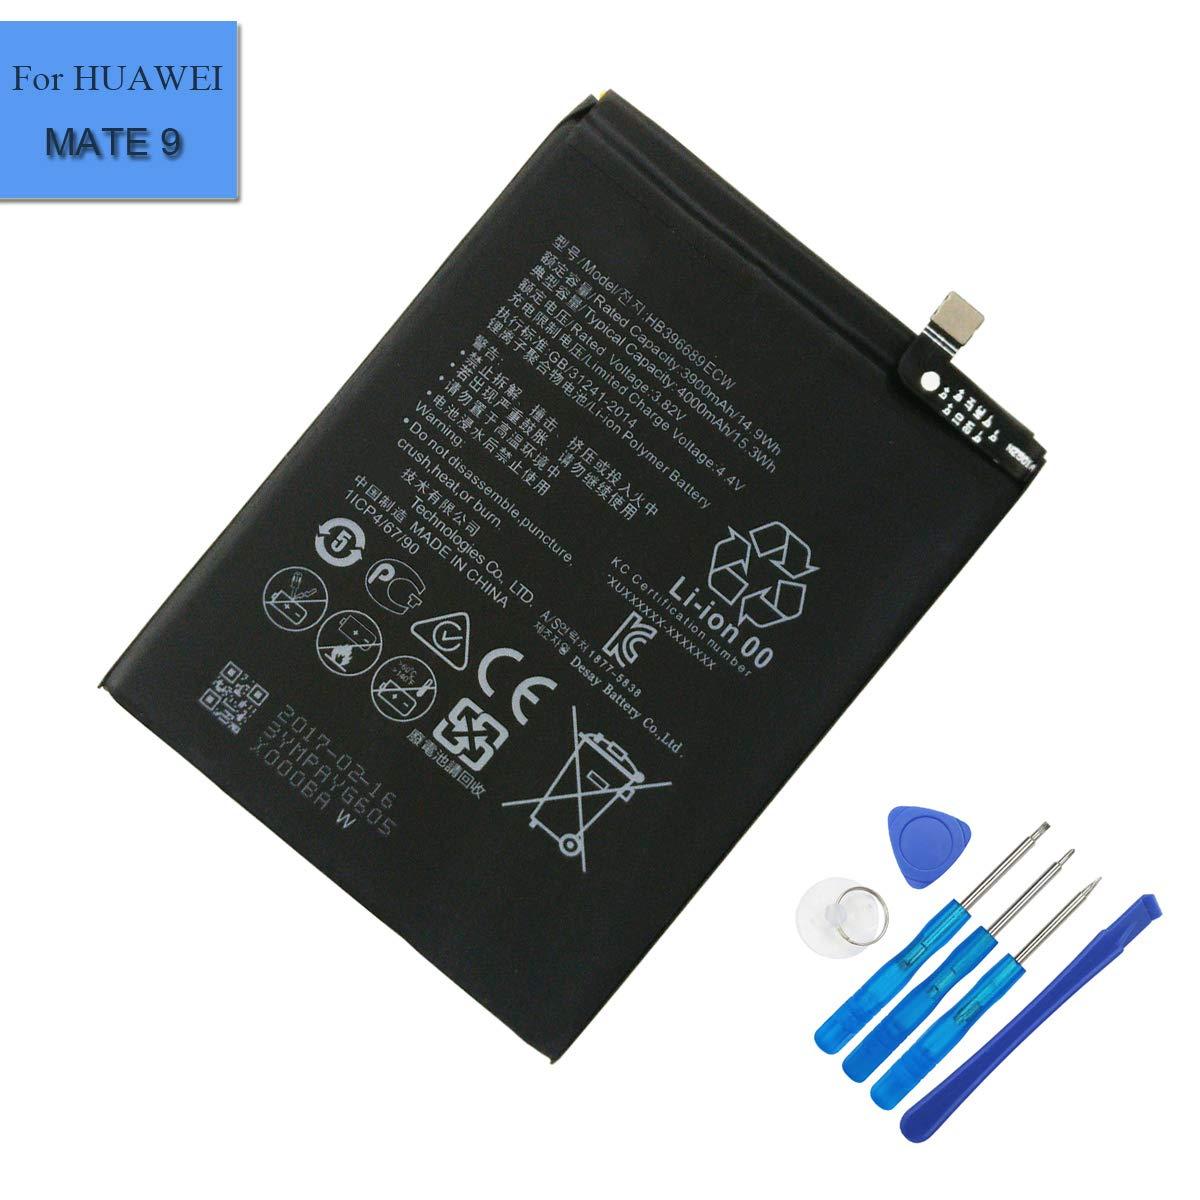 Bateria Celular Li Polymer HB396689ECW Compatible con Huawei Ascend Mate 9 Mate 9 MHA L09 MHA L29 MHA TL00